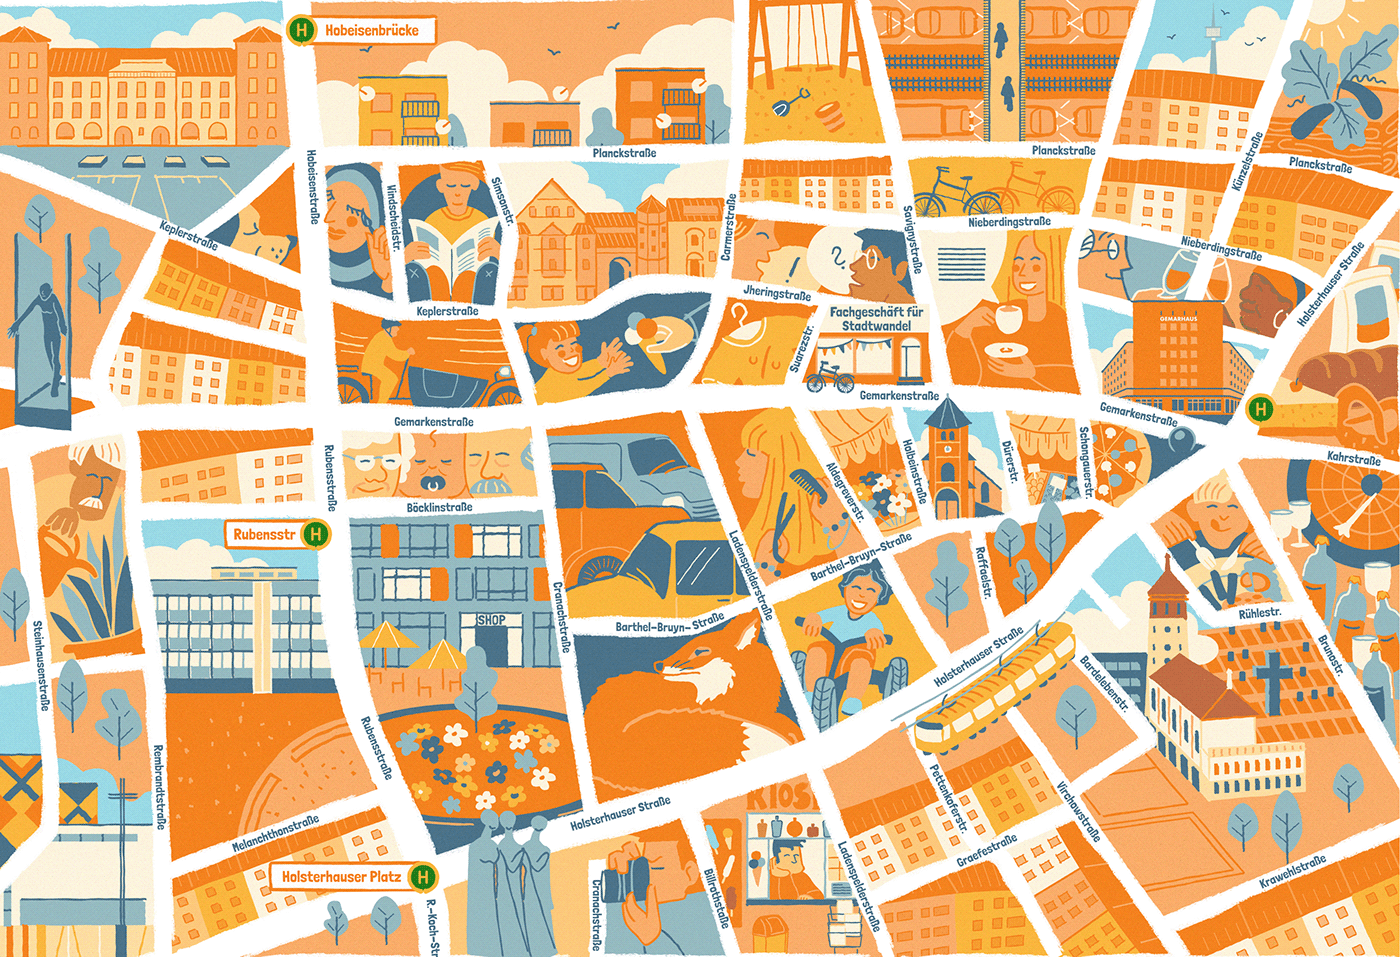 illustrated city-map of essen-hosterhausen, germany